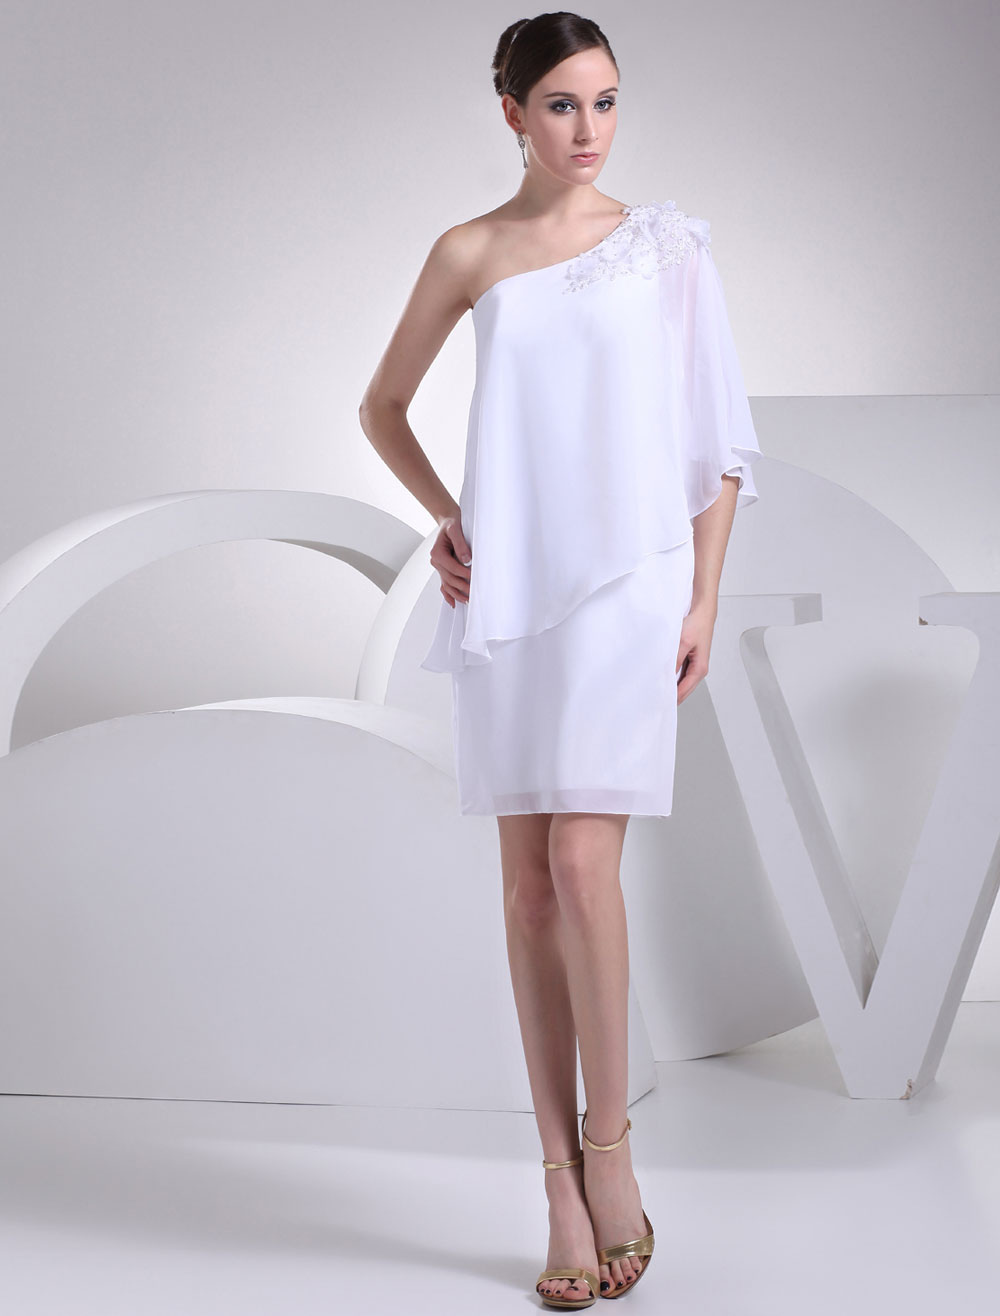 White Bridesmaid Dress One-Shoulder Applique Beading Flower Sheath Knee-Length Wedding Party Dress